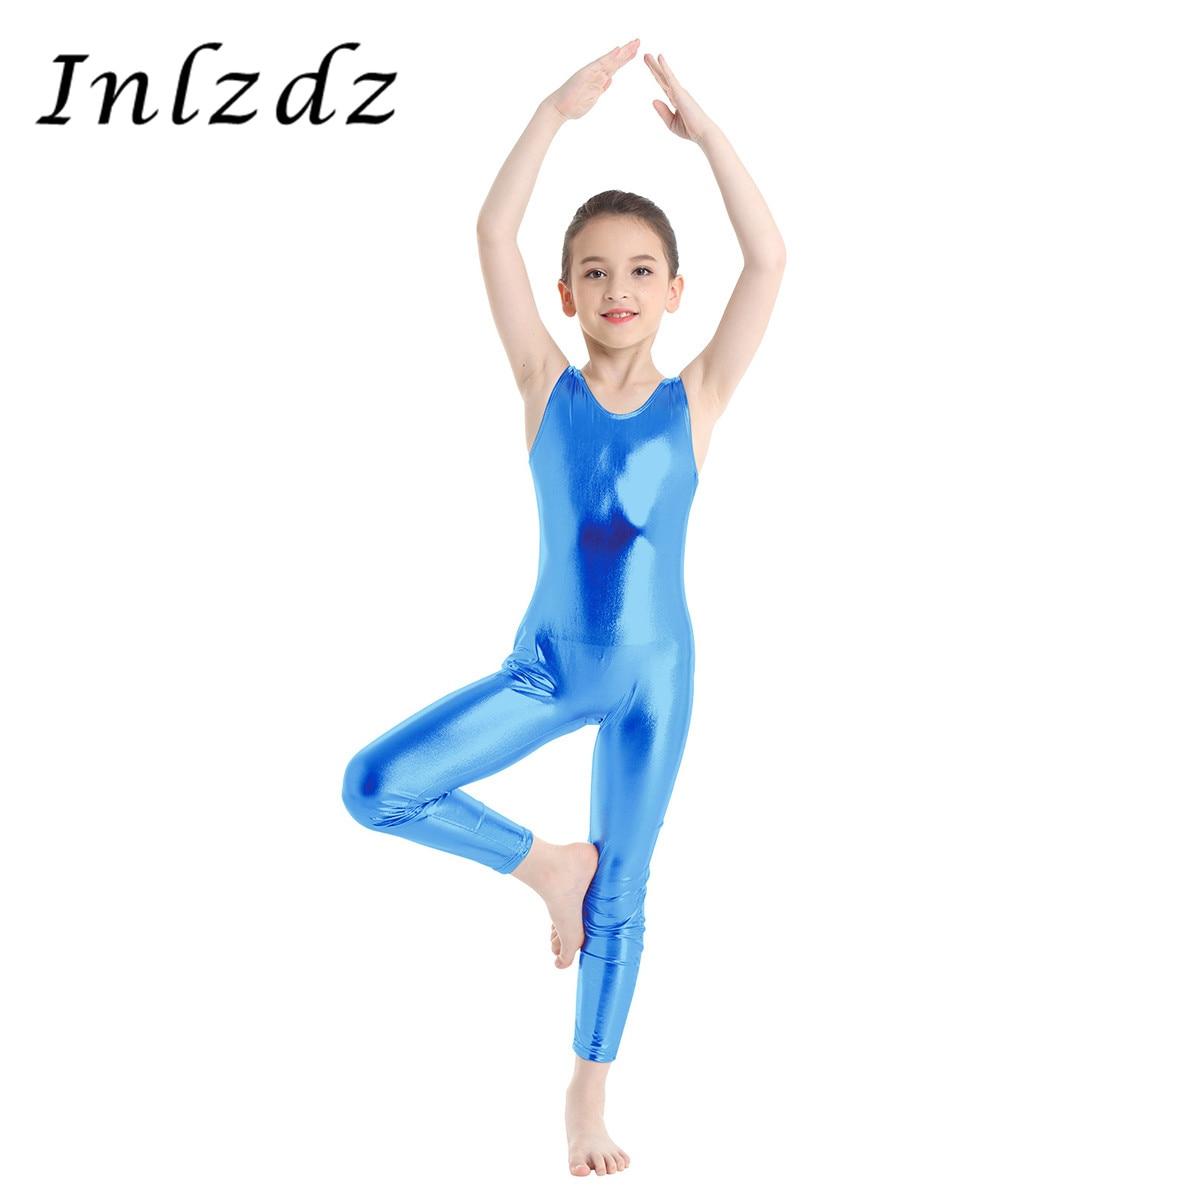 inlzdz Kids Girls Sleeveless Mesh Splice Ballet Dance Gymnastics Leotard Bodysuit Ballroom Dance wear Costumes